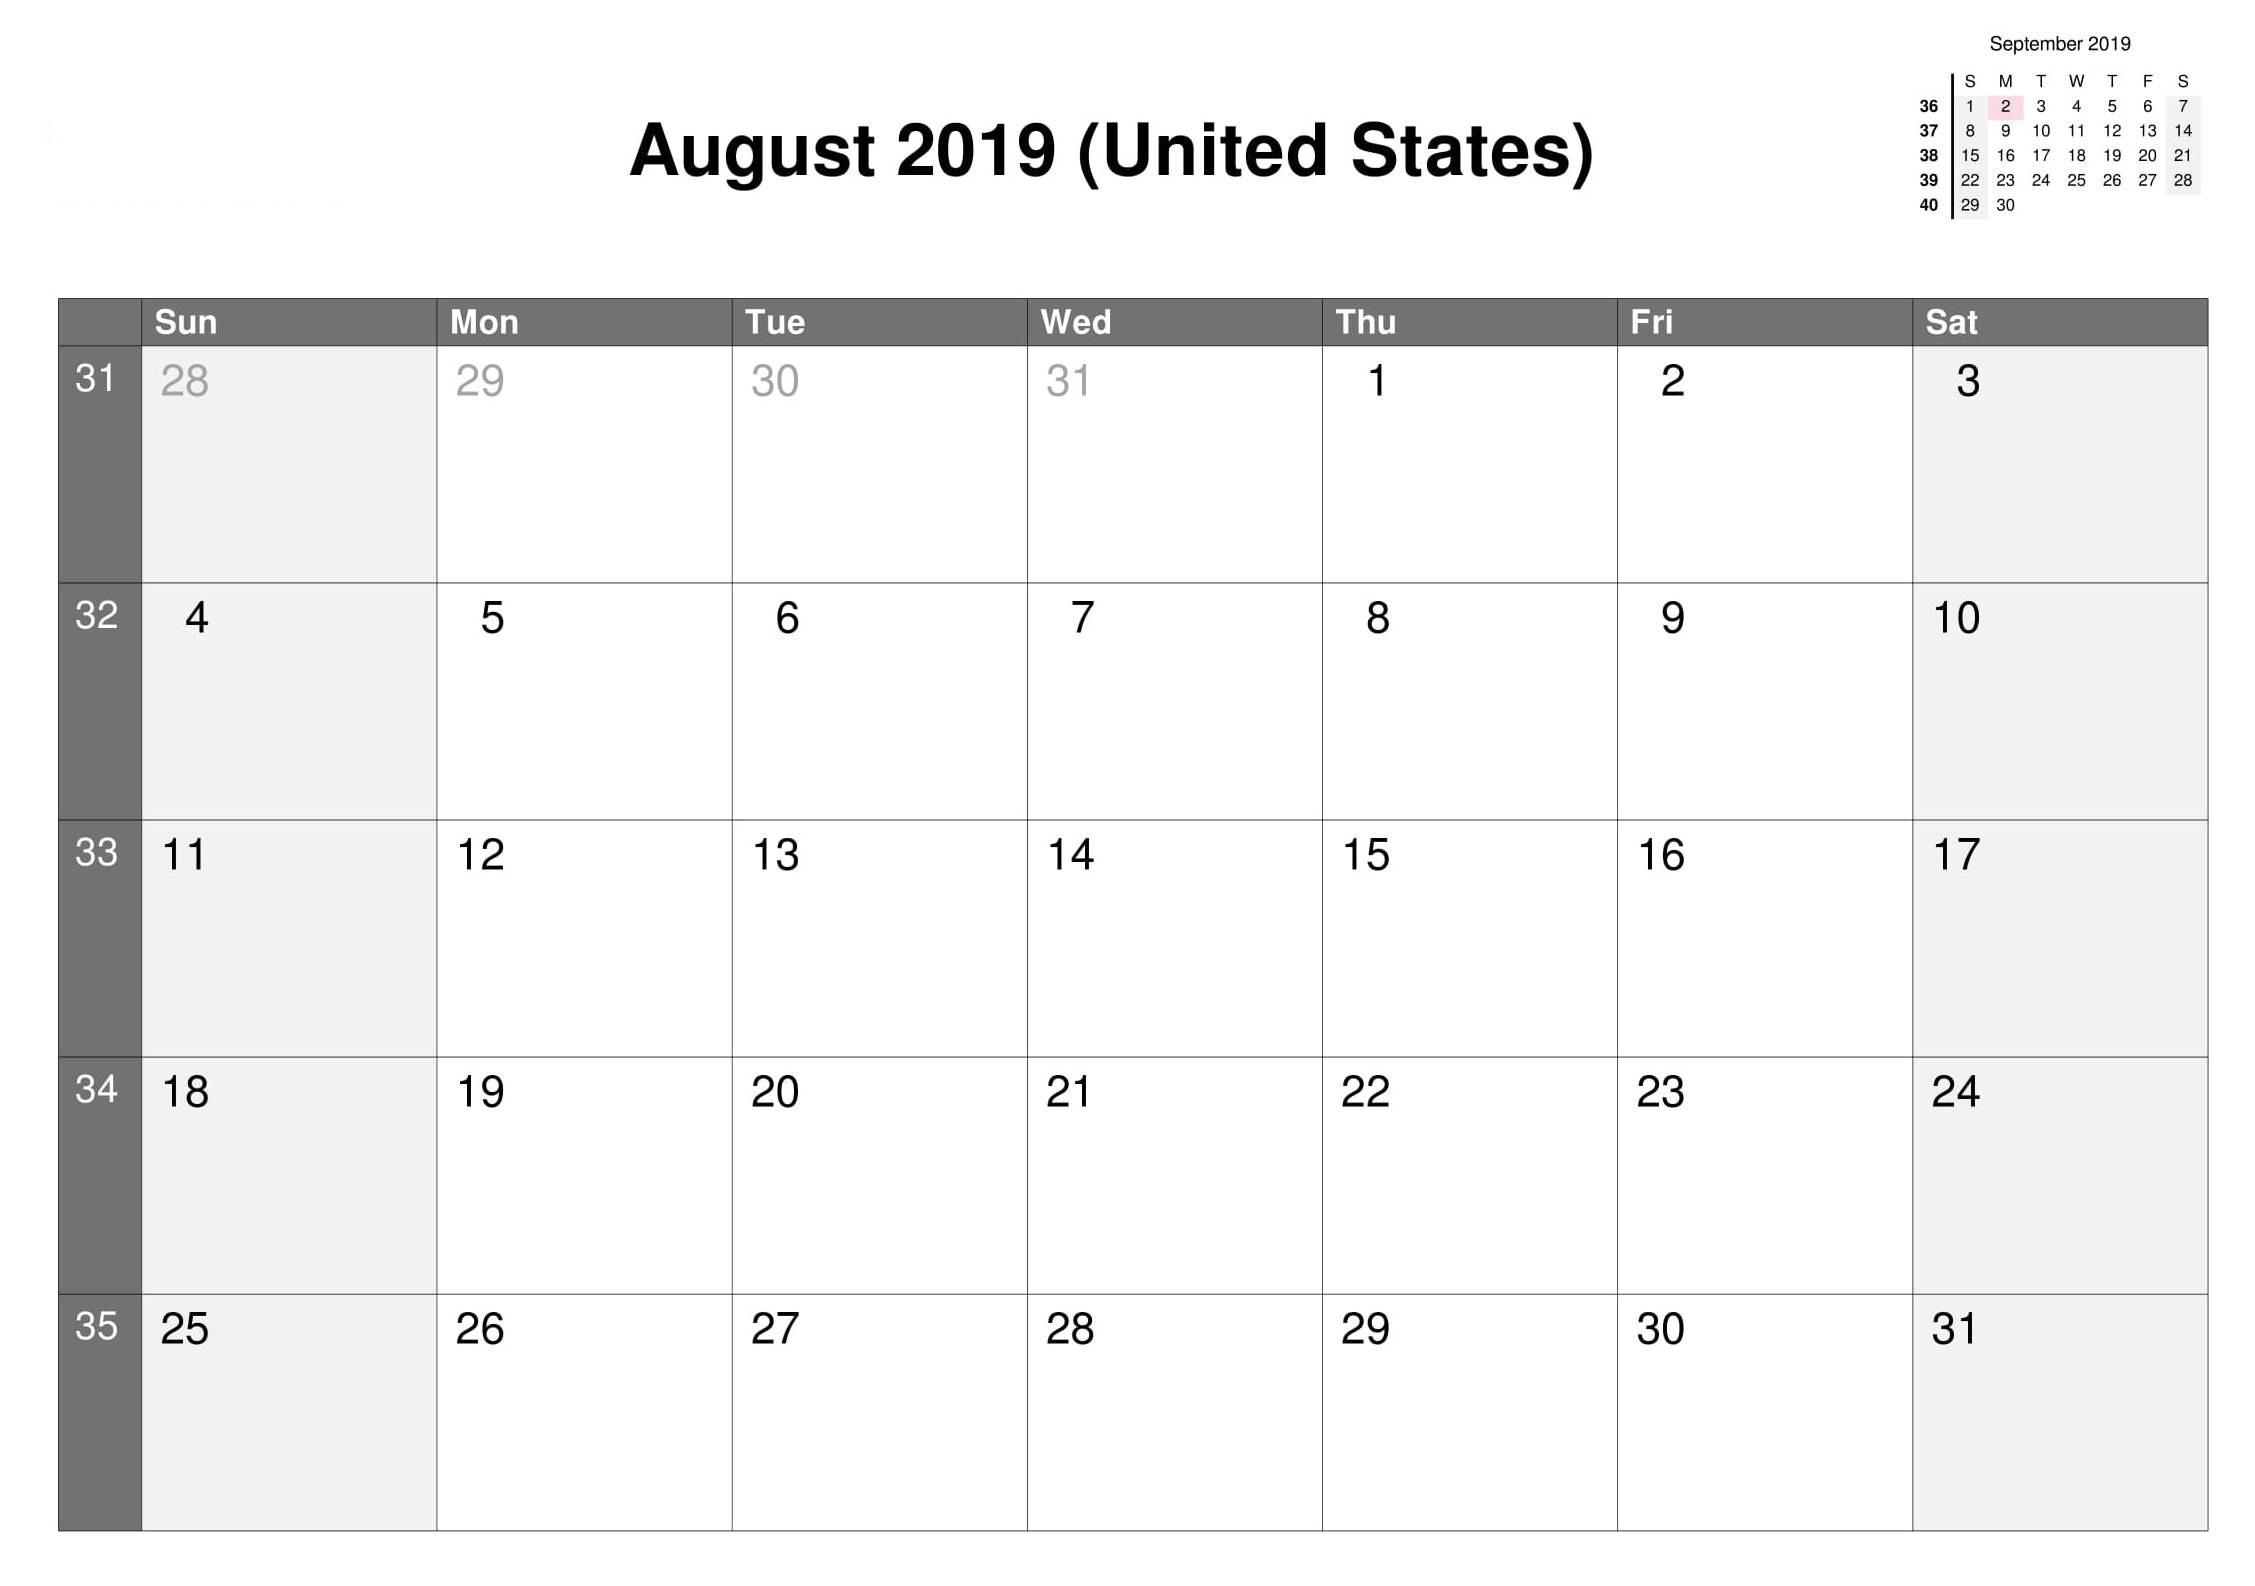 August 2019 Calendar US Federal Holidays